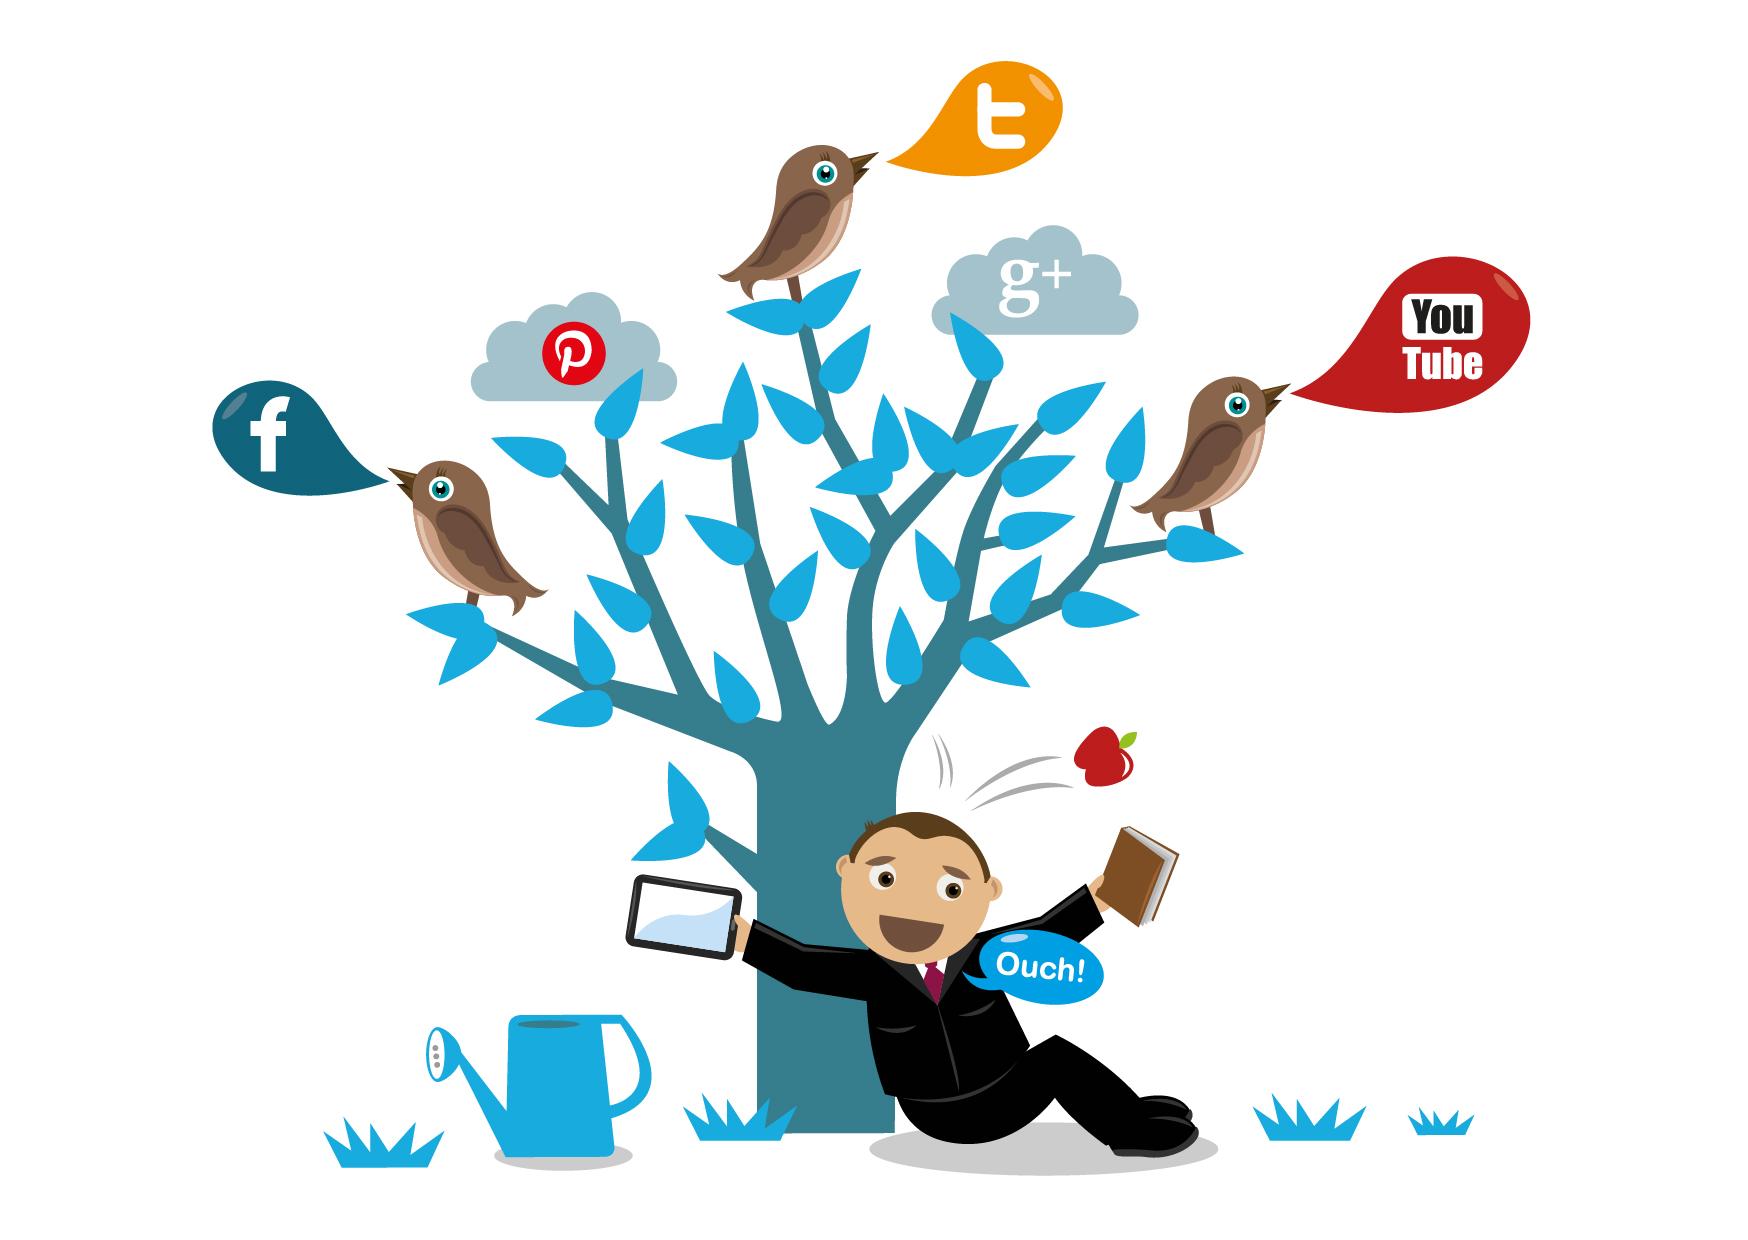 5 concepte de baza despre marketingul online pe care ar trebui sa le stie orice antreprenor